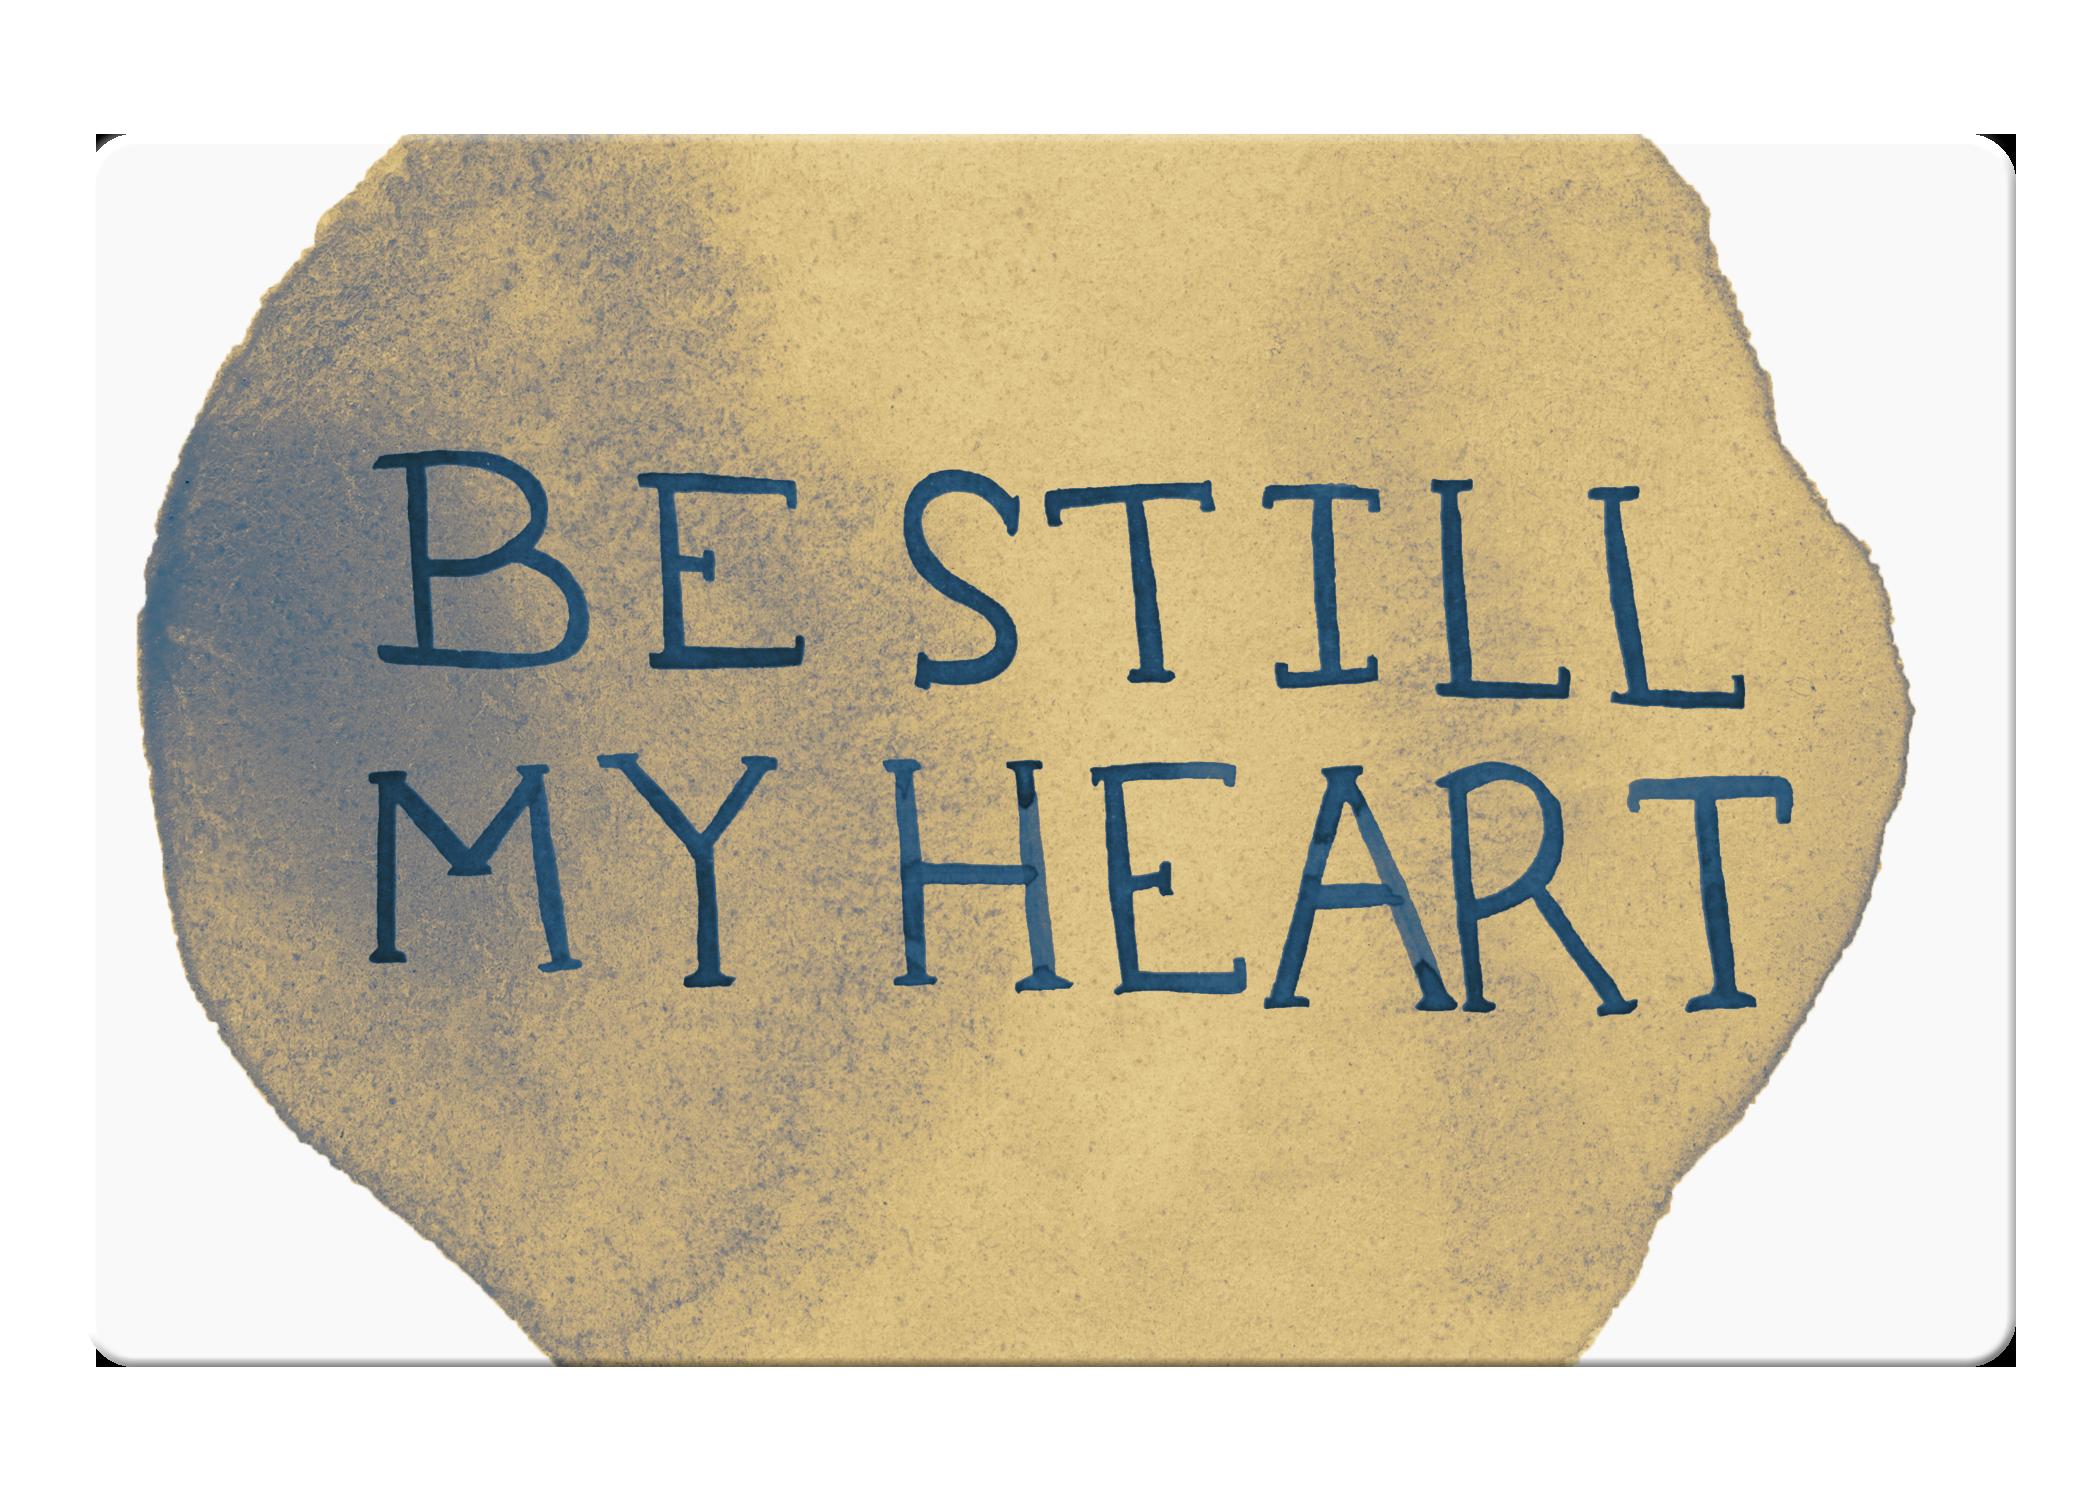 GIFT_CARD_STILL_HEART2.png